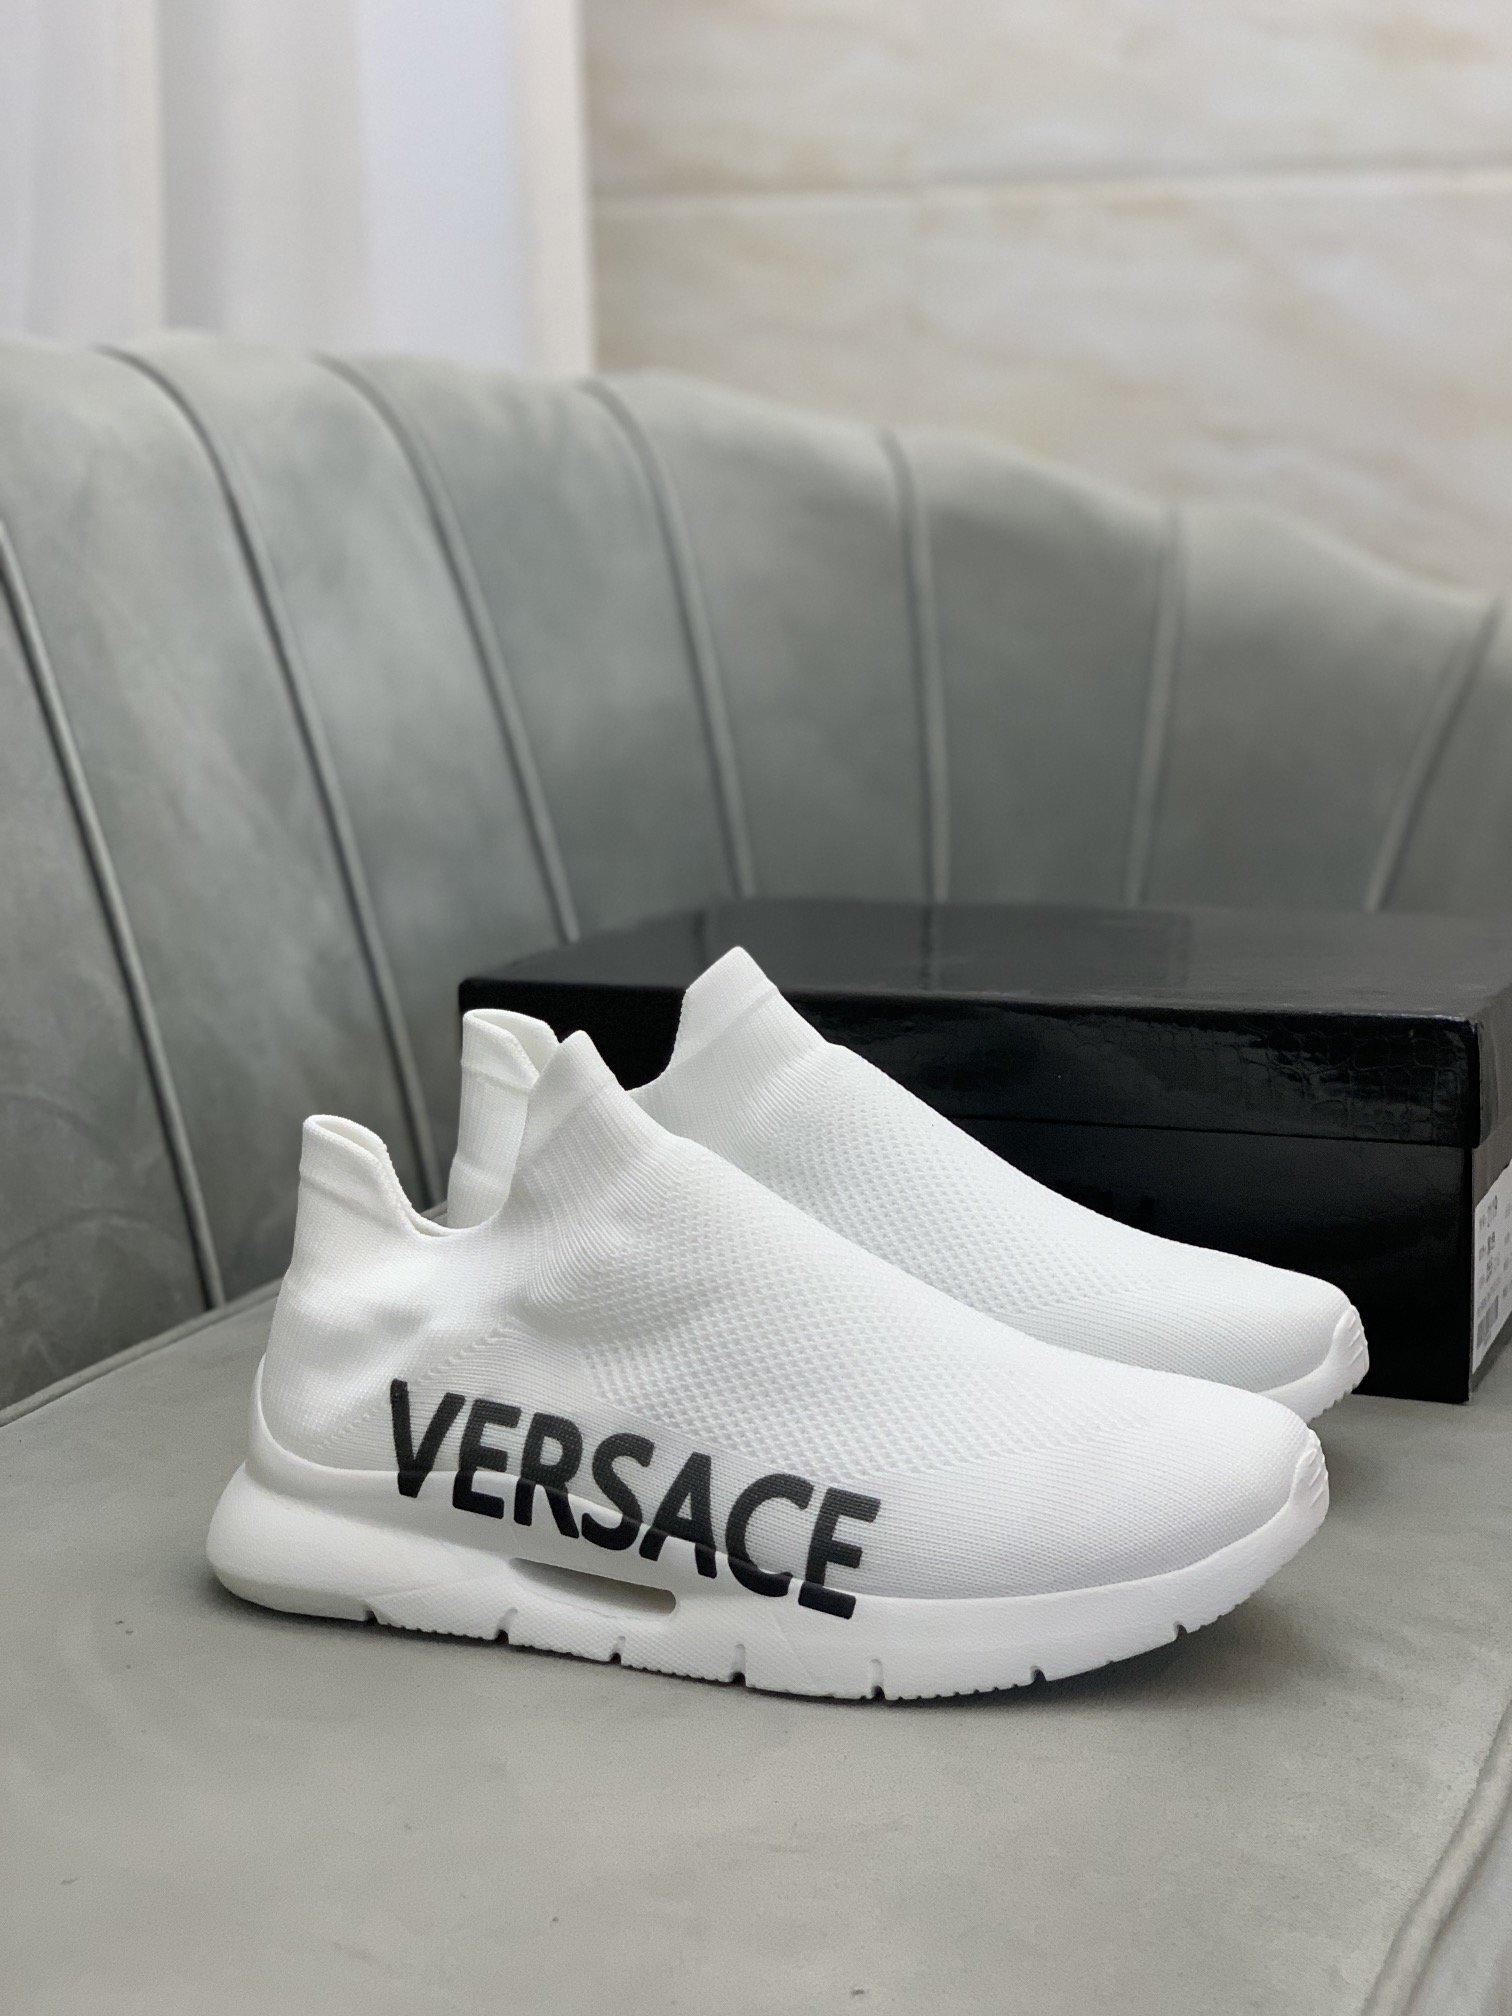 Versac*范思*低帮运动鞋正码码